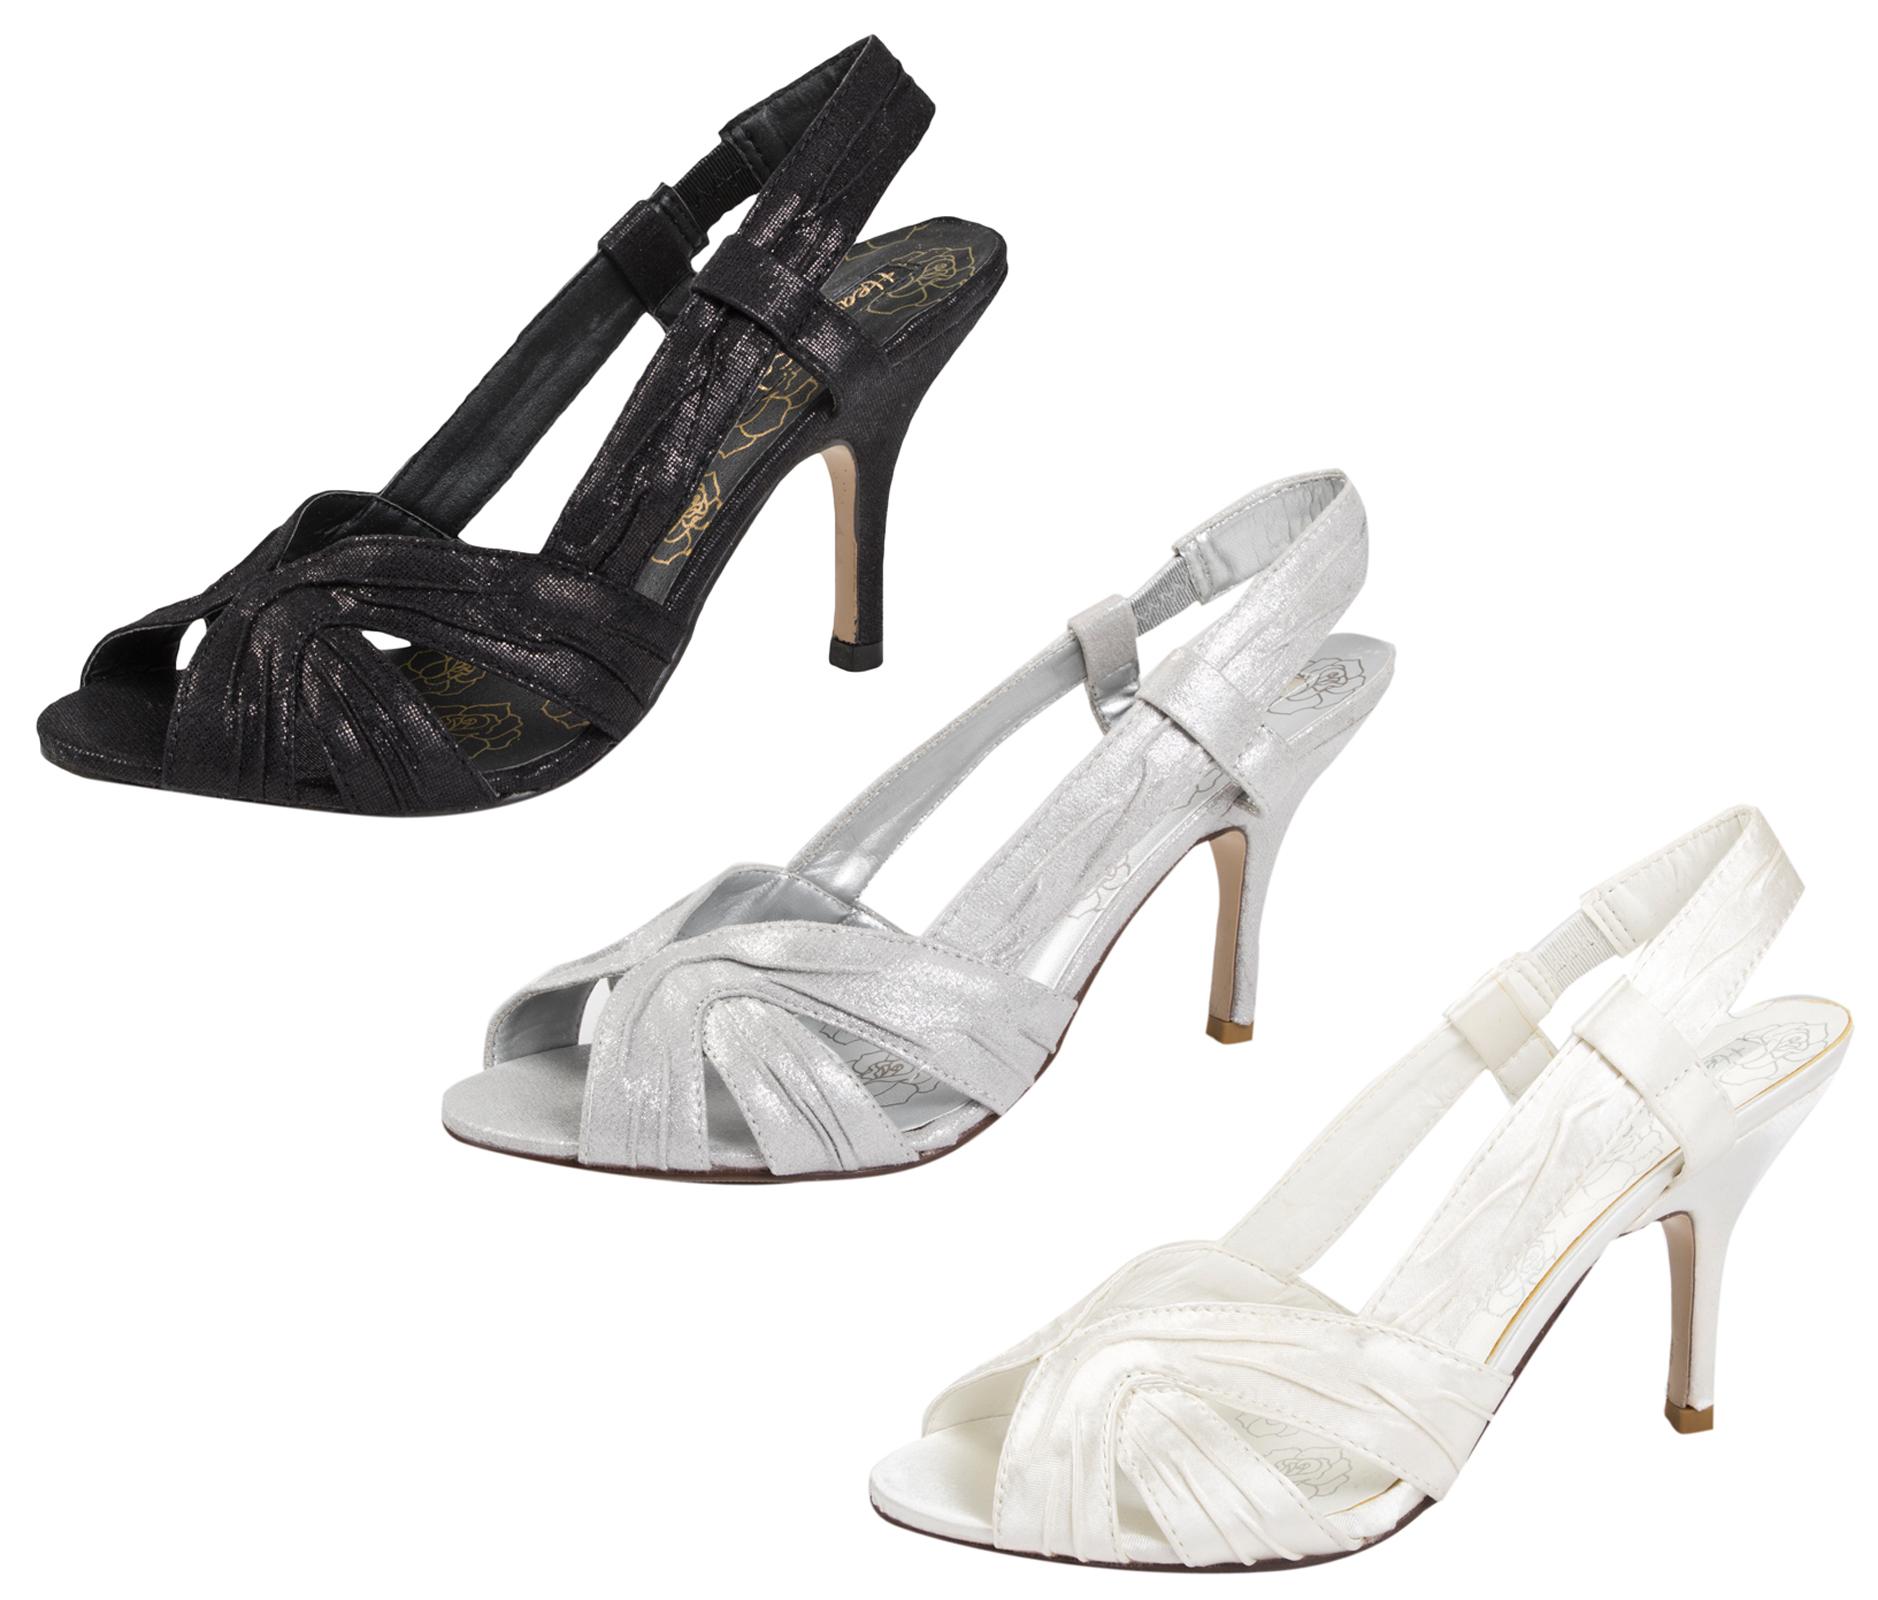 0953f79f02c Womens Satin Bridal Wedding Shoes Stiletto High Heels Strappy Prom Sandals  Size